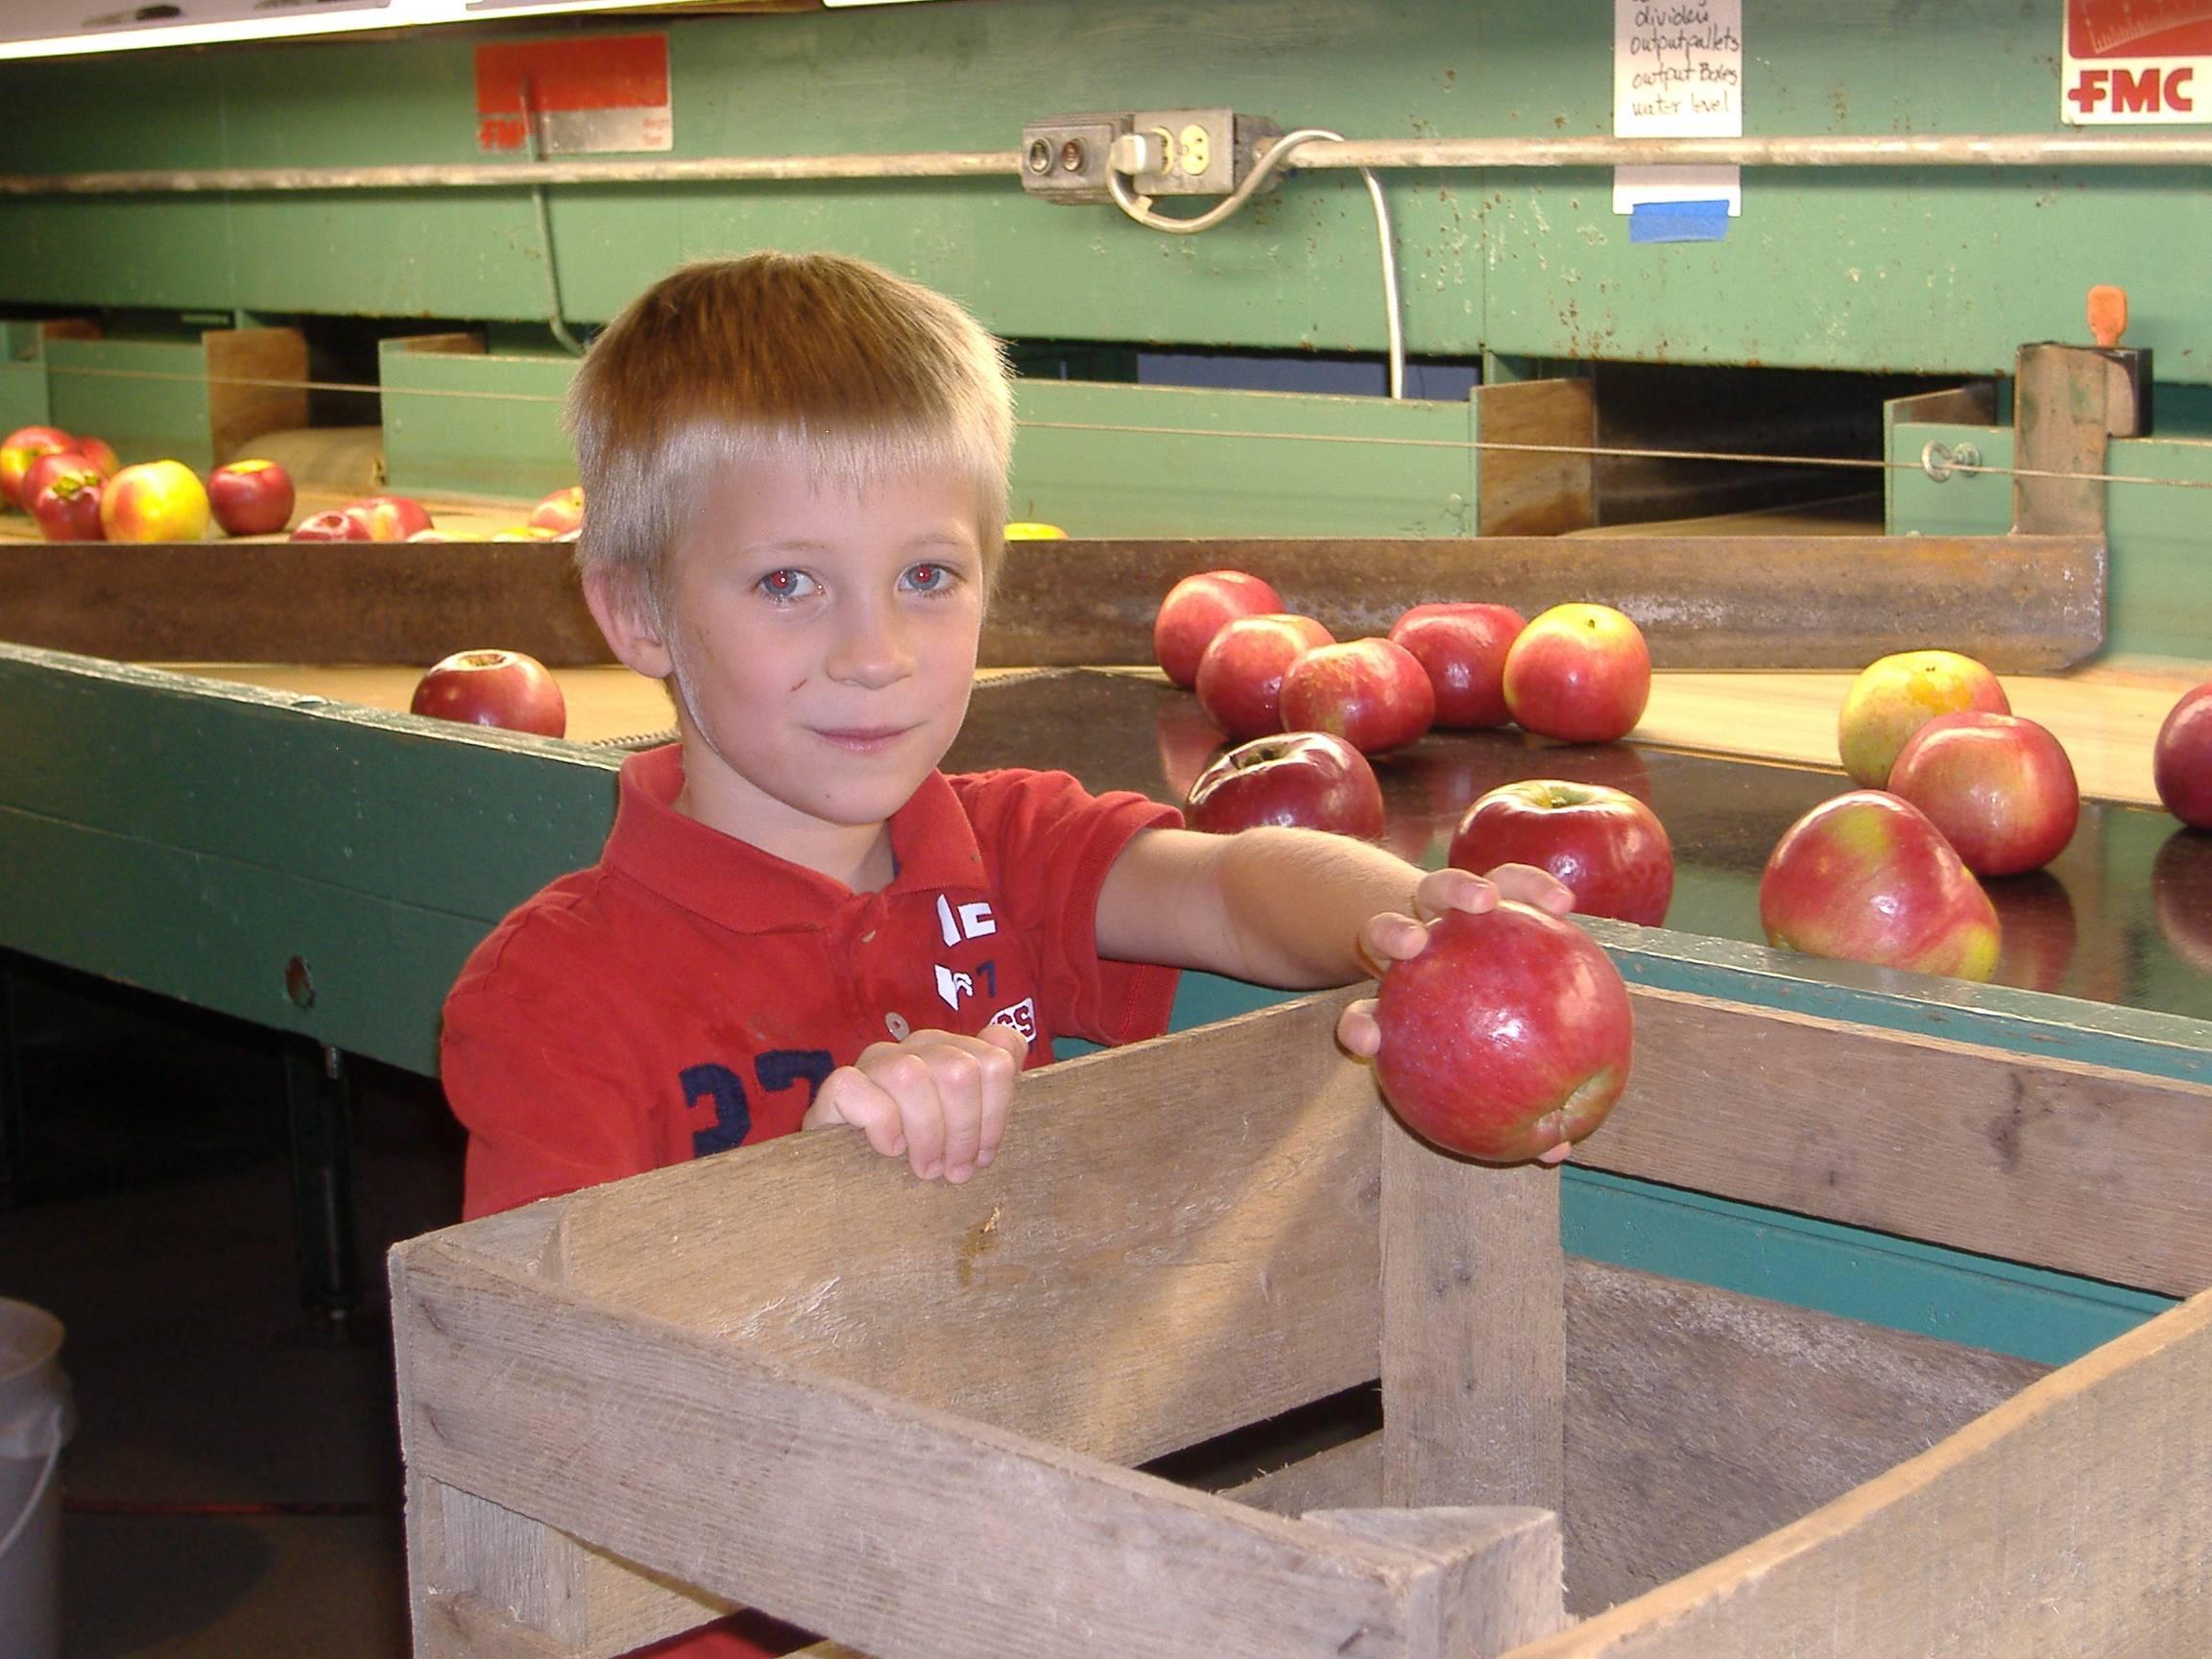 Gunnar inspecting Cortland apples